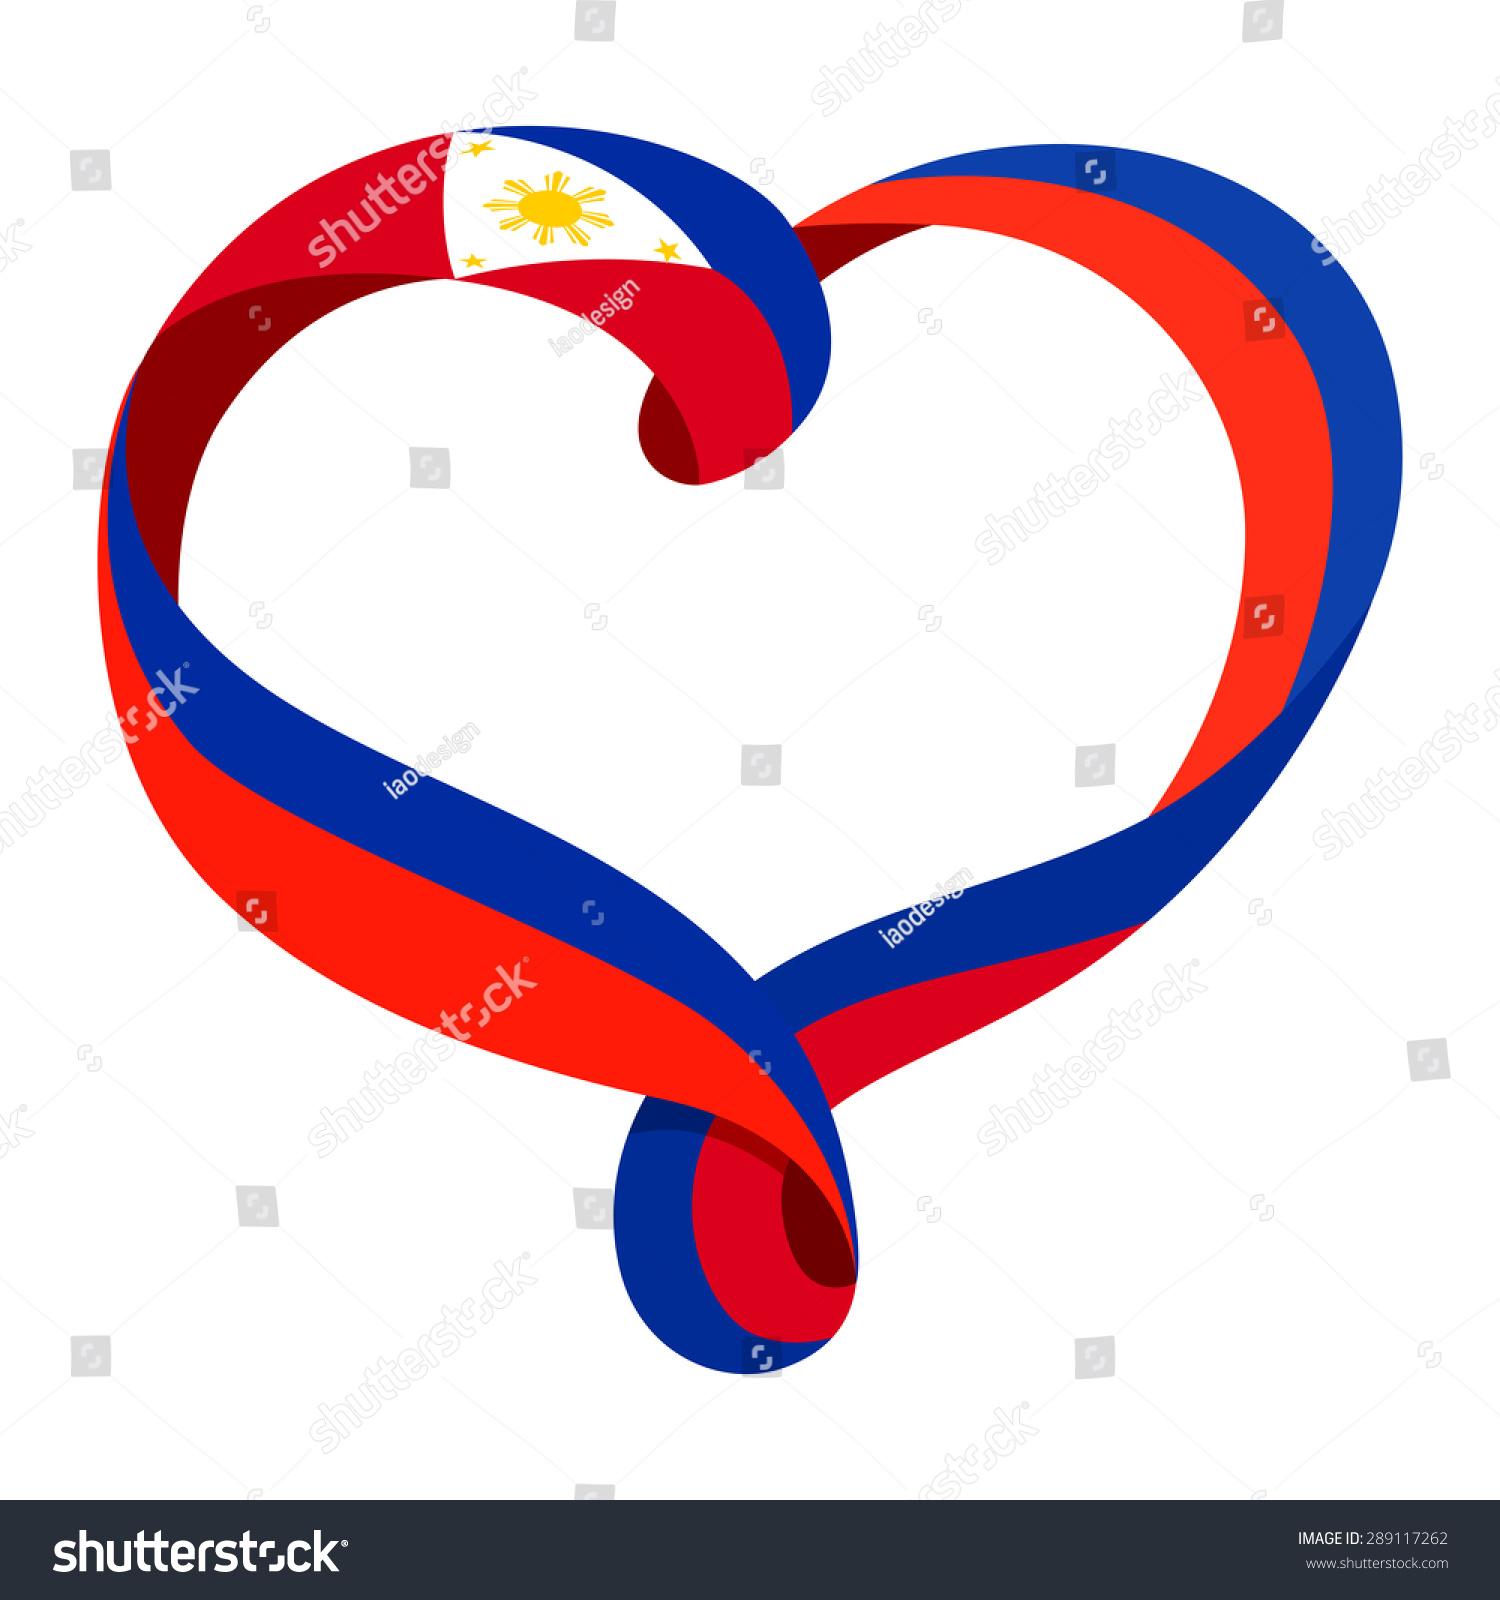 Philippines flag ribbonshaped heart symbol love stock vector philippines flag ribbon shaped heart symbol of love and harmony vector illustration buycottarizona Images